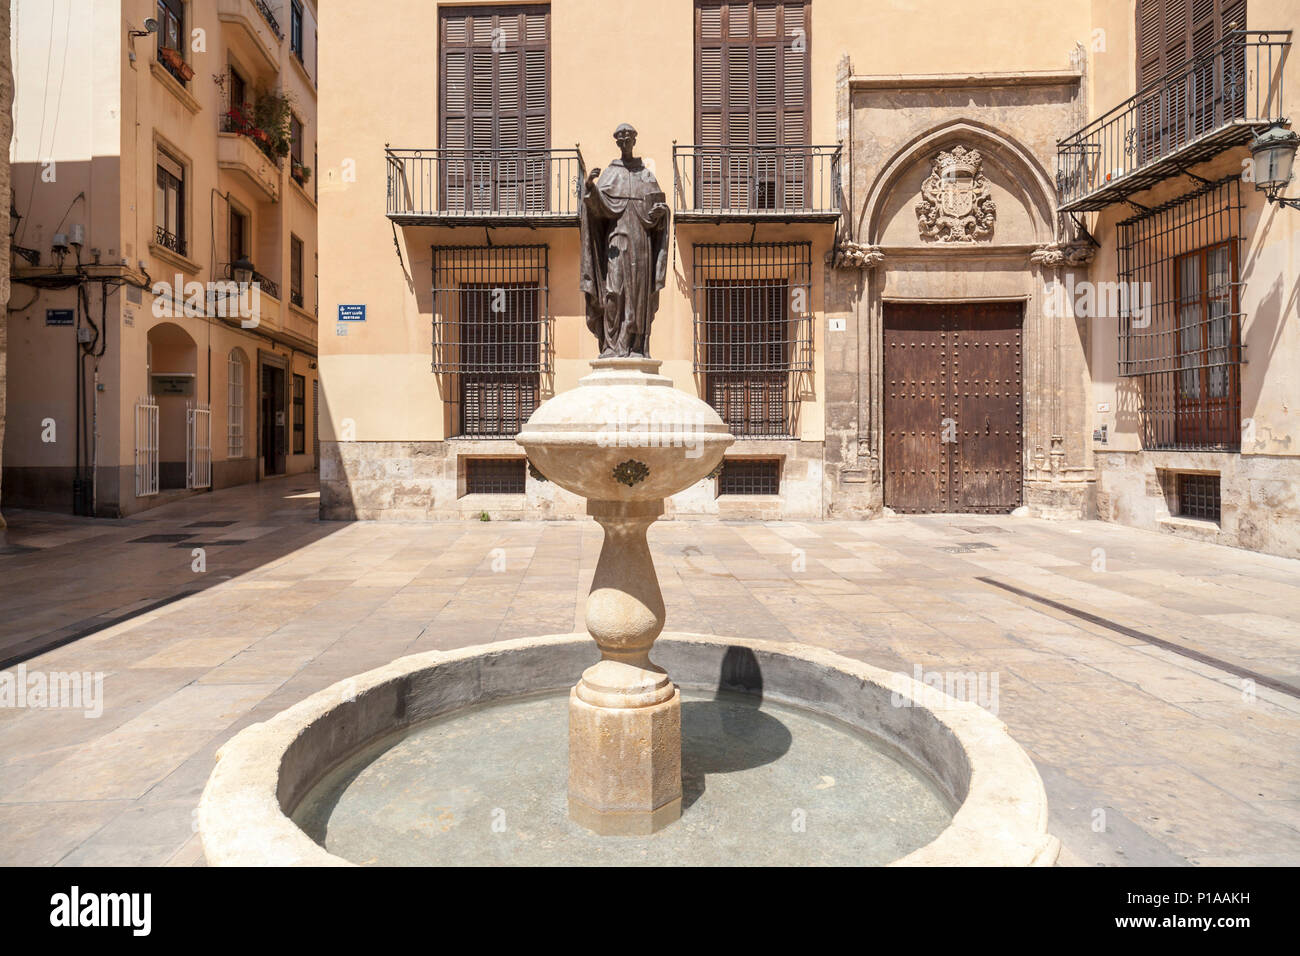 City center,square, plaza Sant Lluis Bertran. - Stock Image